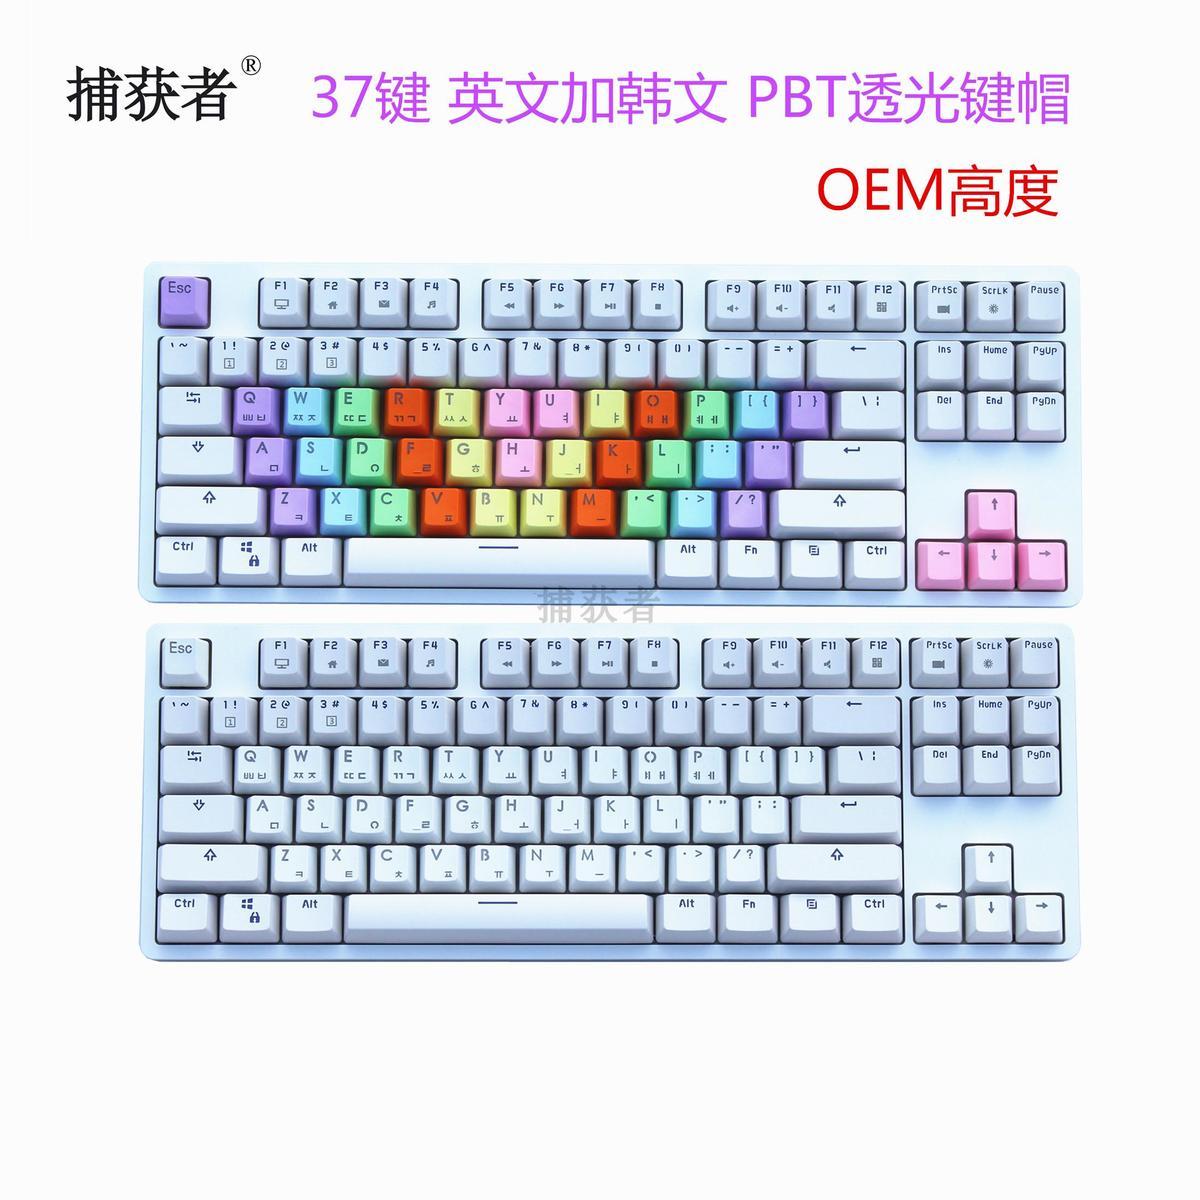 37 Keys PBT Korean OEM Height Keycaps Translucent Mechanical Keyboard Key Cap For Corsair FILCO IKBC Cherry MX Switch